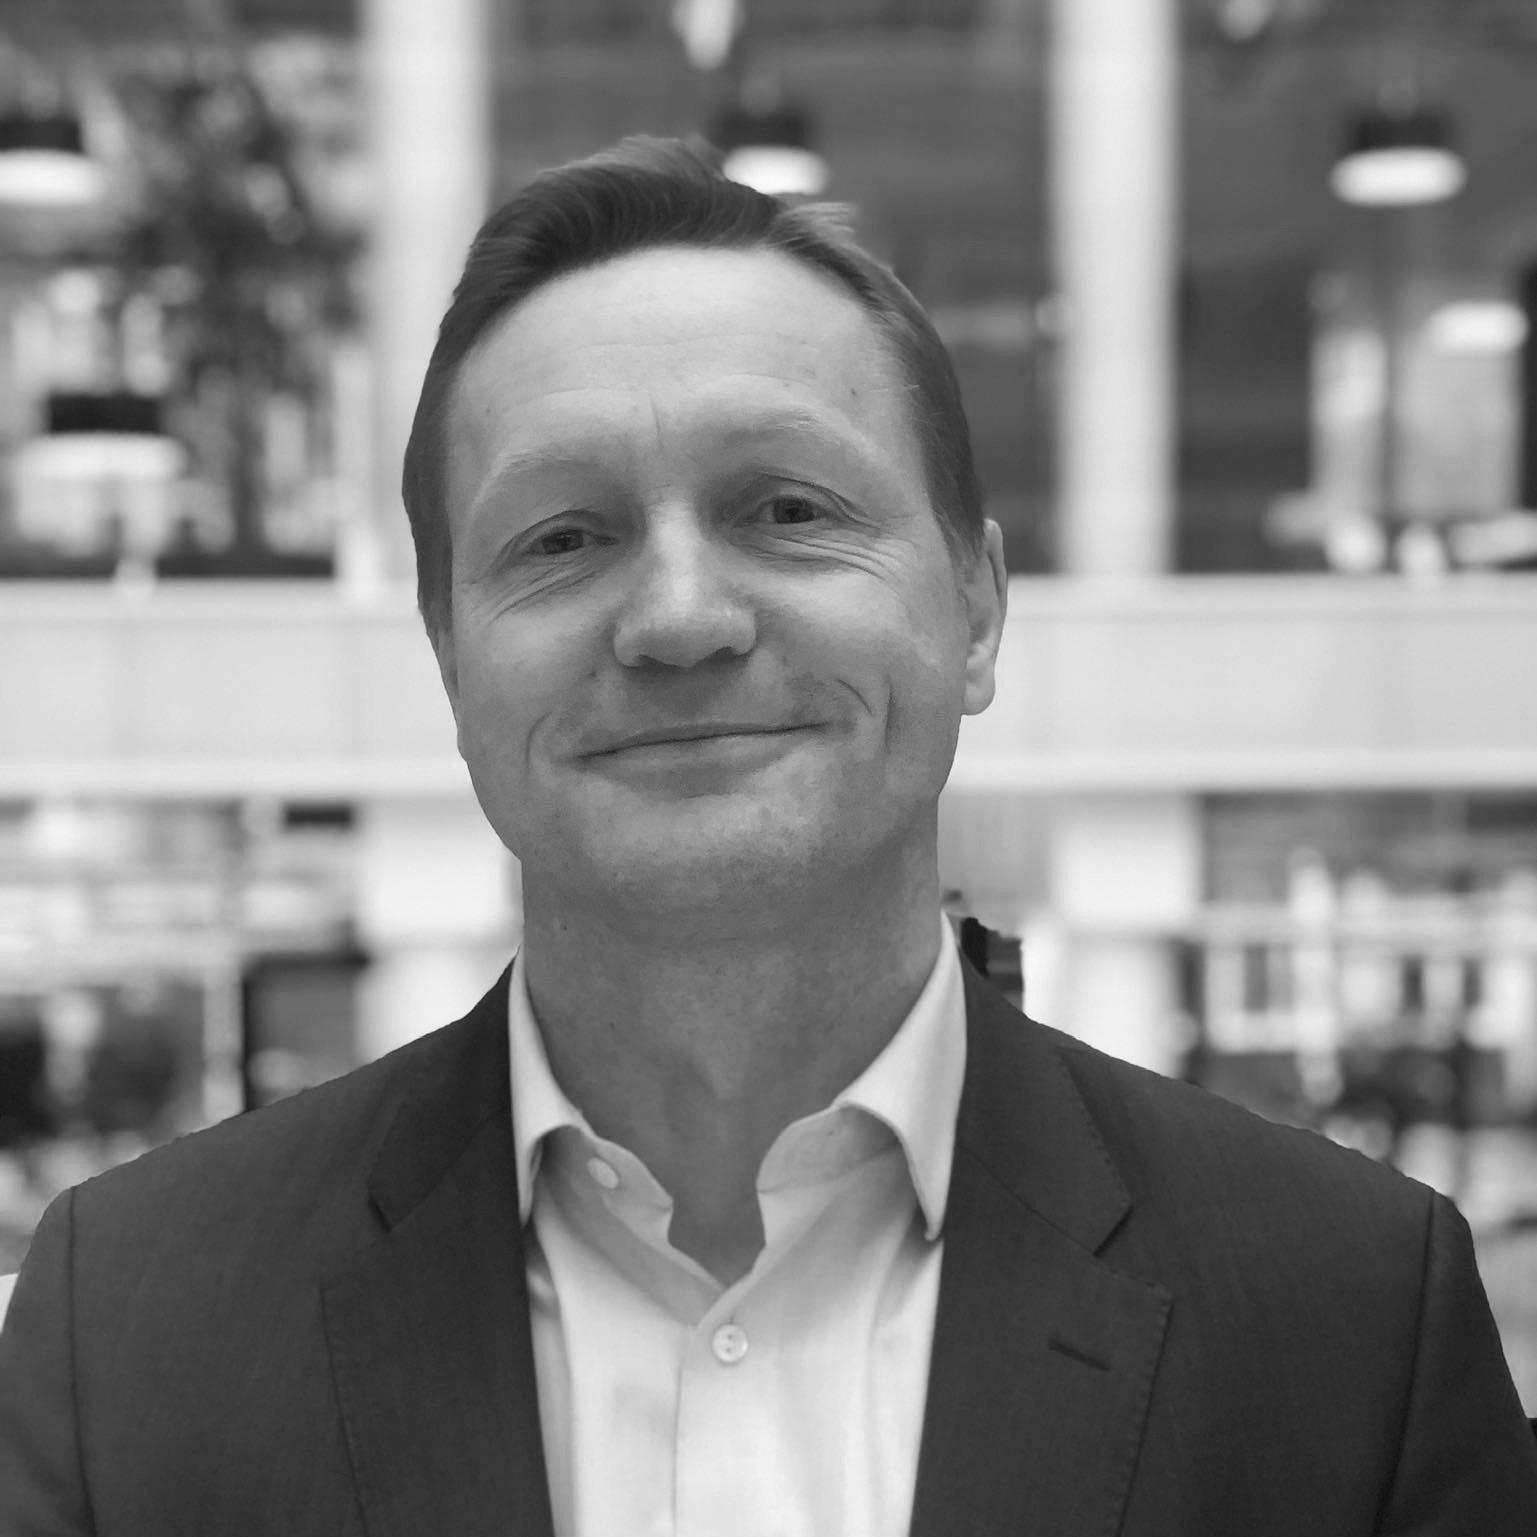 Vidar Aksland - Innovation Director, SpareBank1 SR-bank